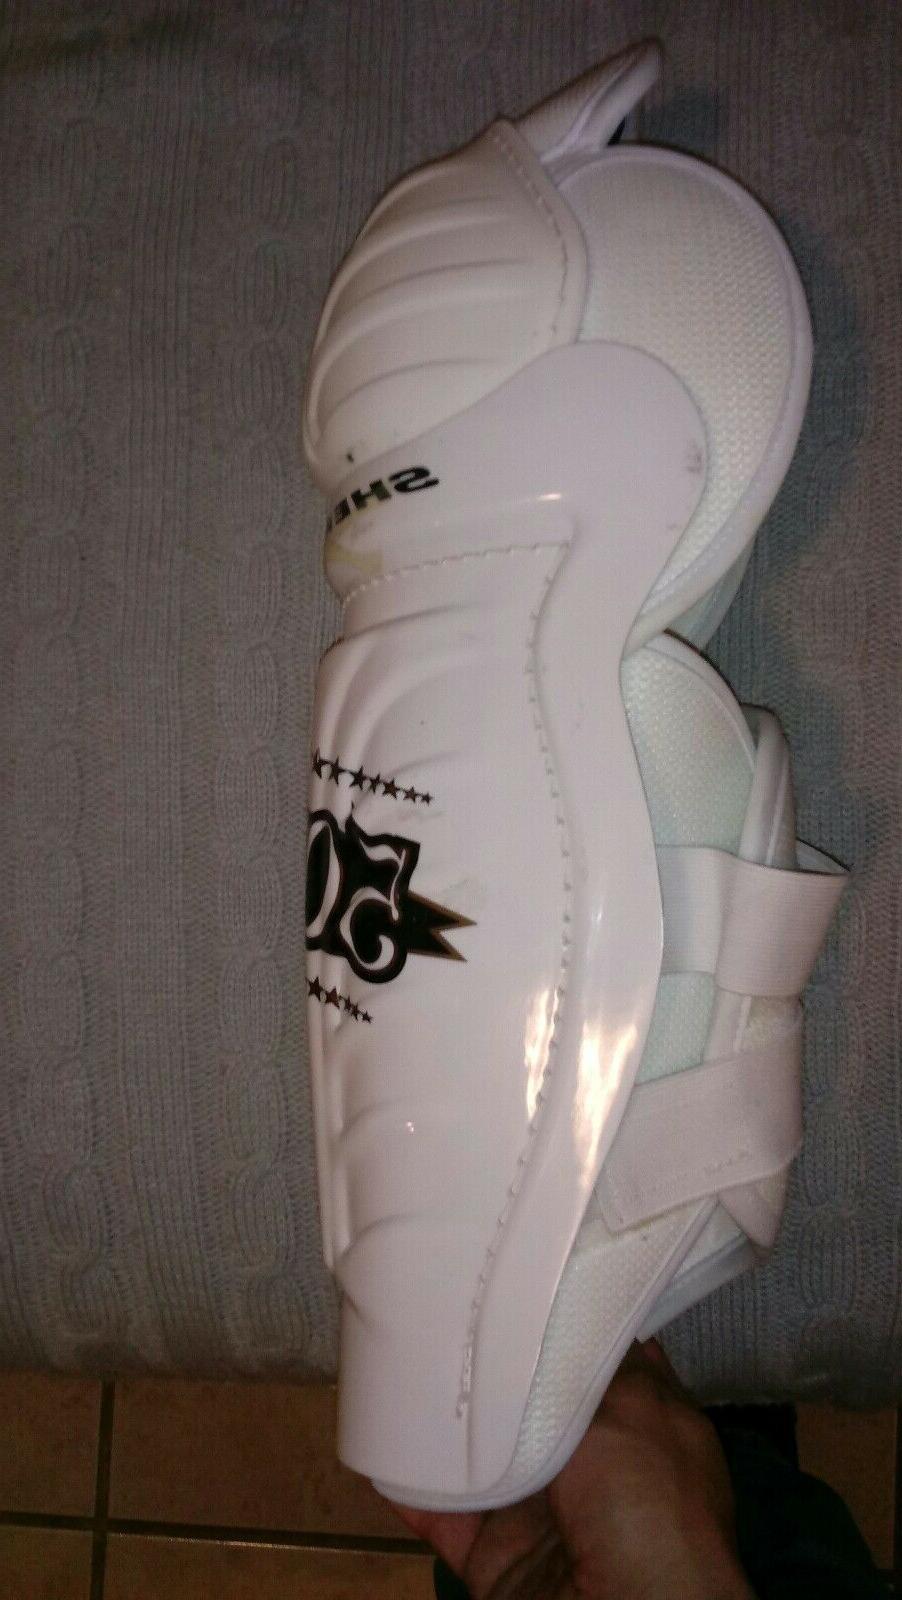 Rolller hockey/Ice with huge duffel